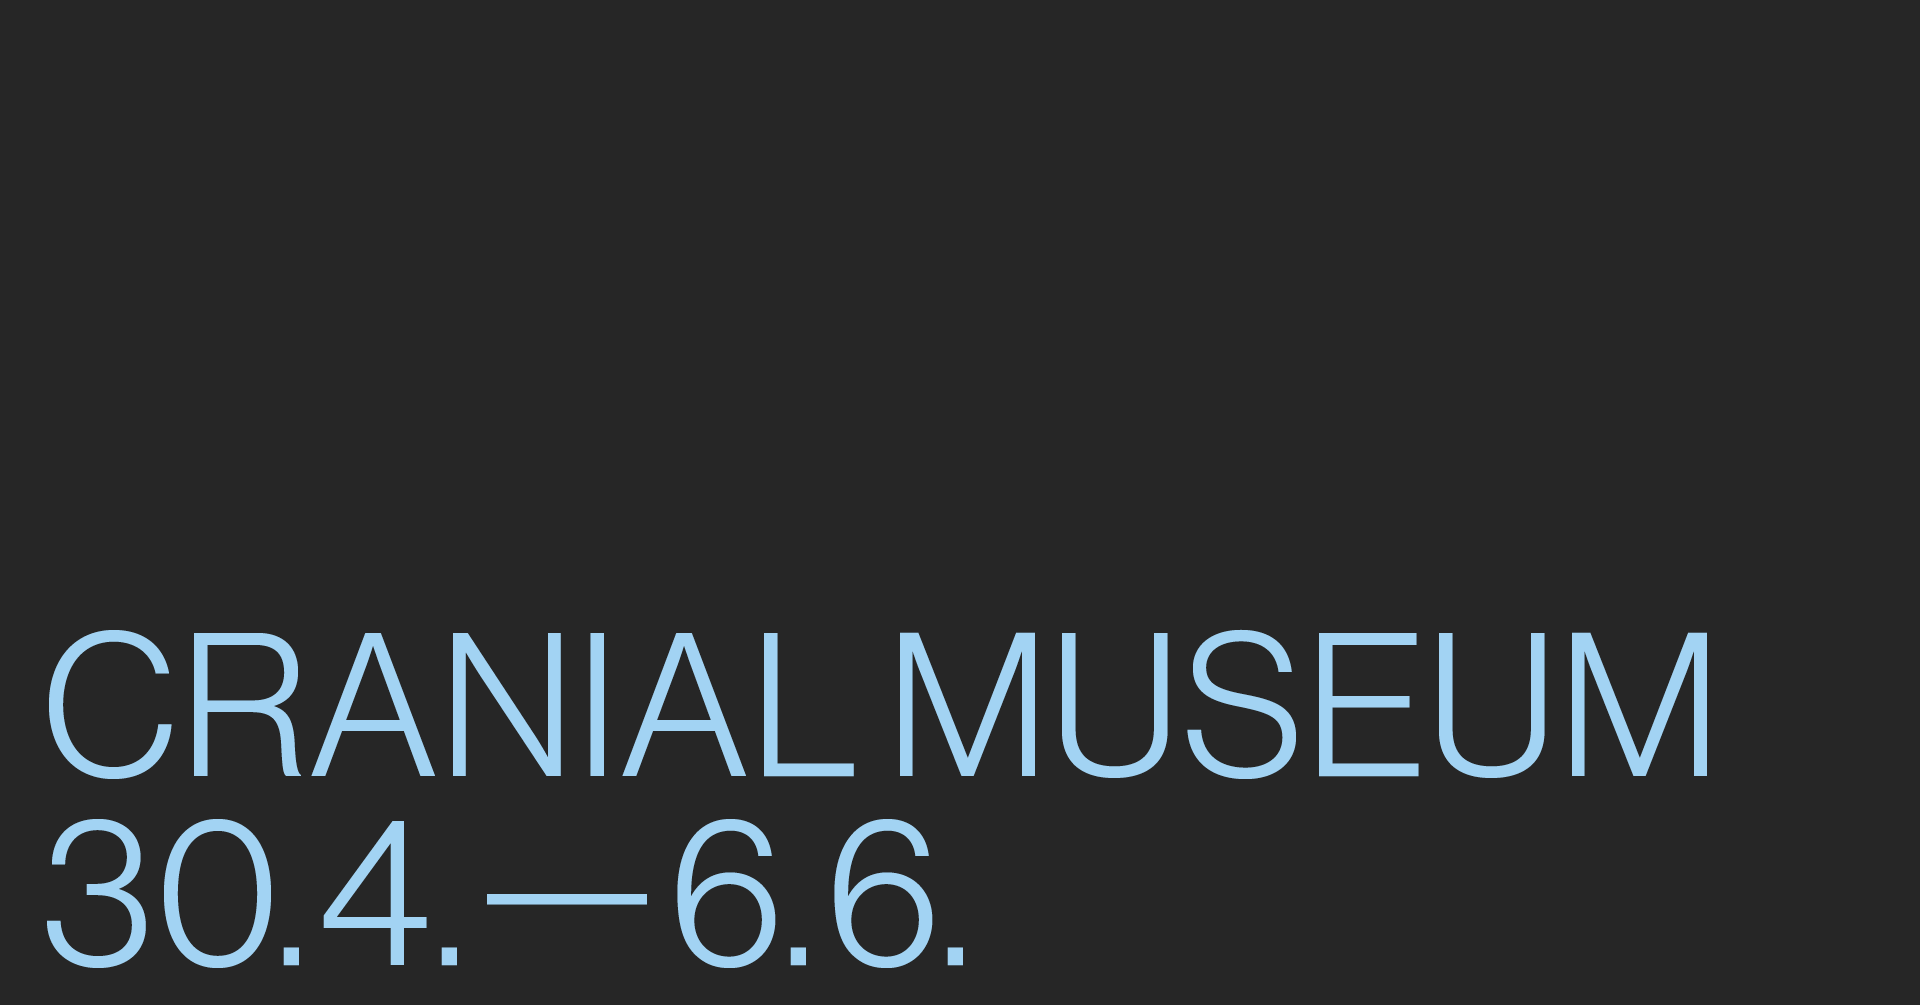 CRANIAL MUSEUM